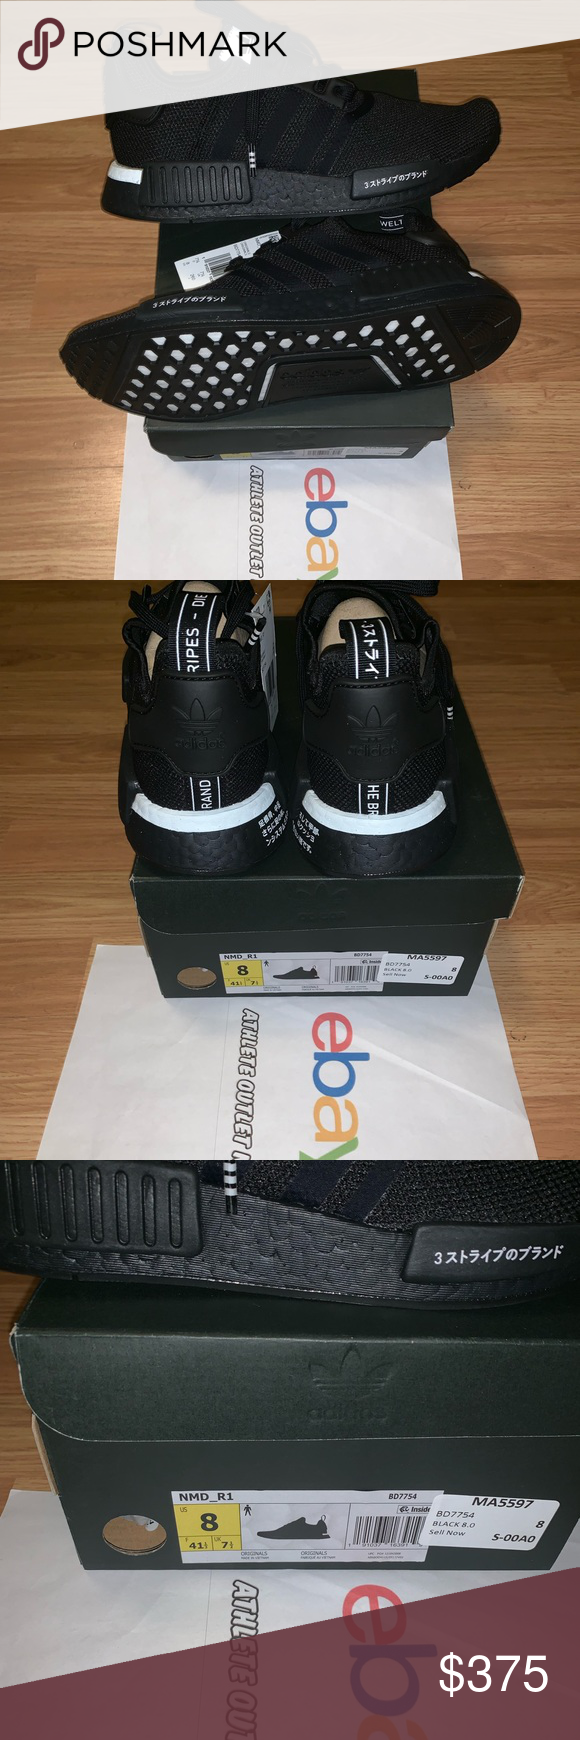 89ed3d06896ff New Adidas Nmd Triple Black Japan Mens Size 8 New Mens Adidas Boost